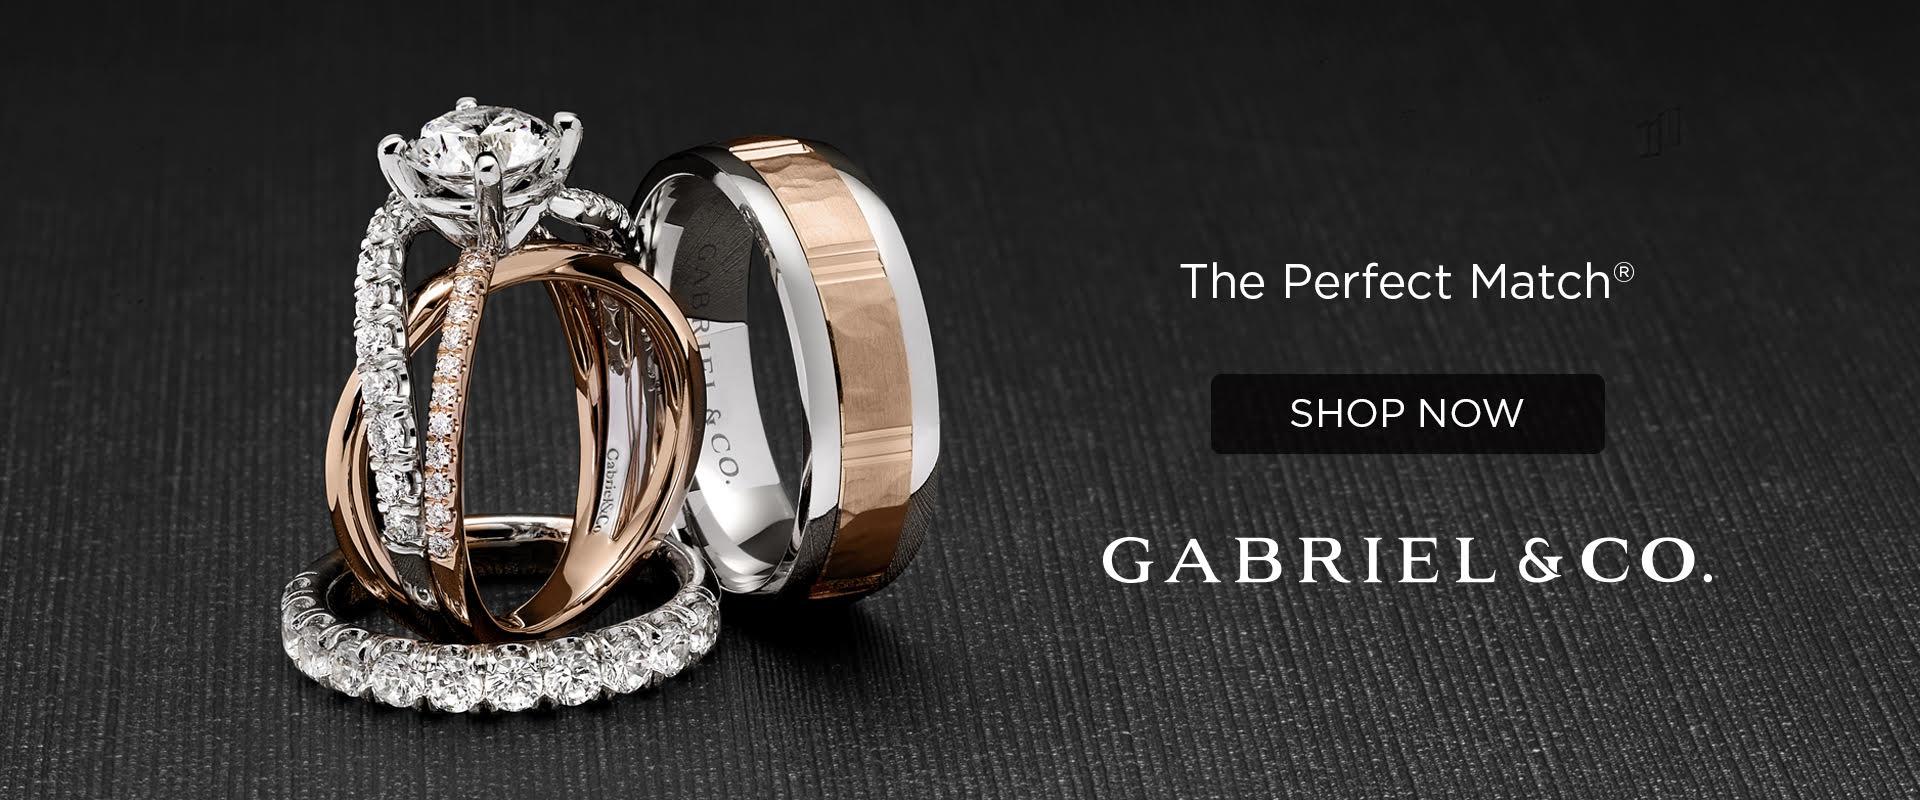 Gabriel Banner Rings